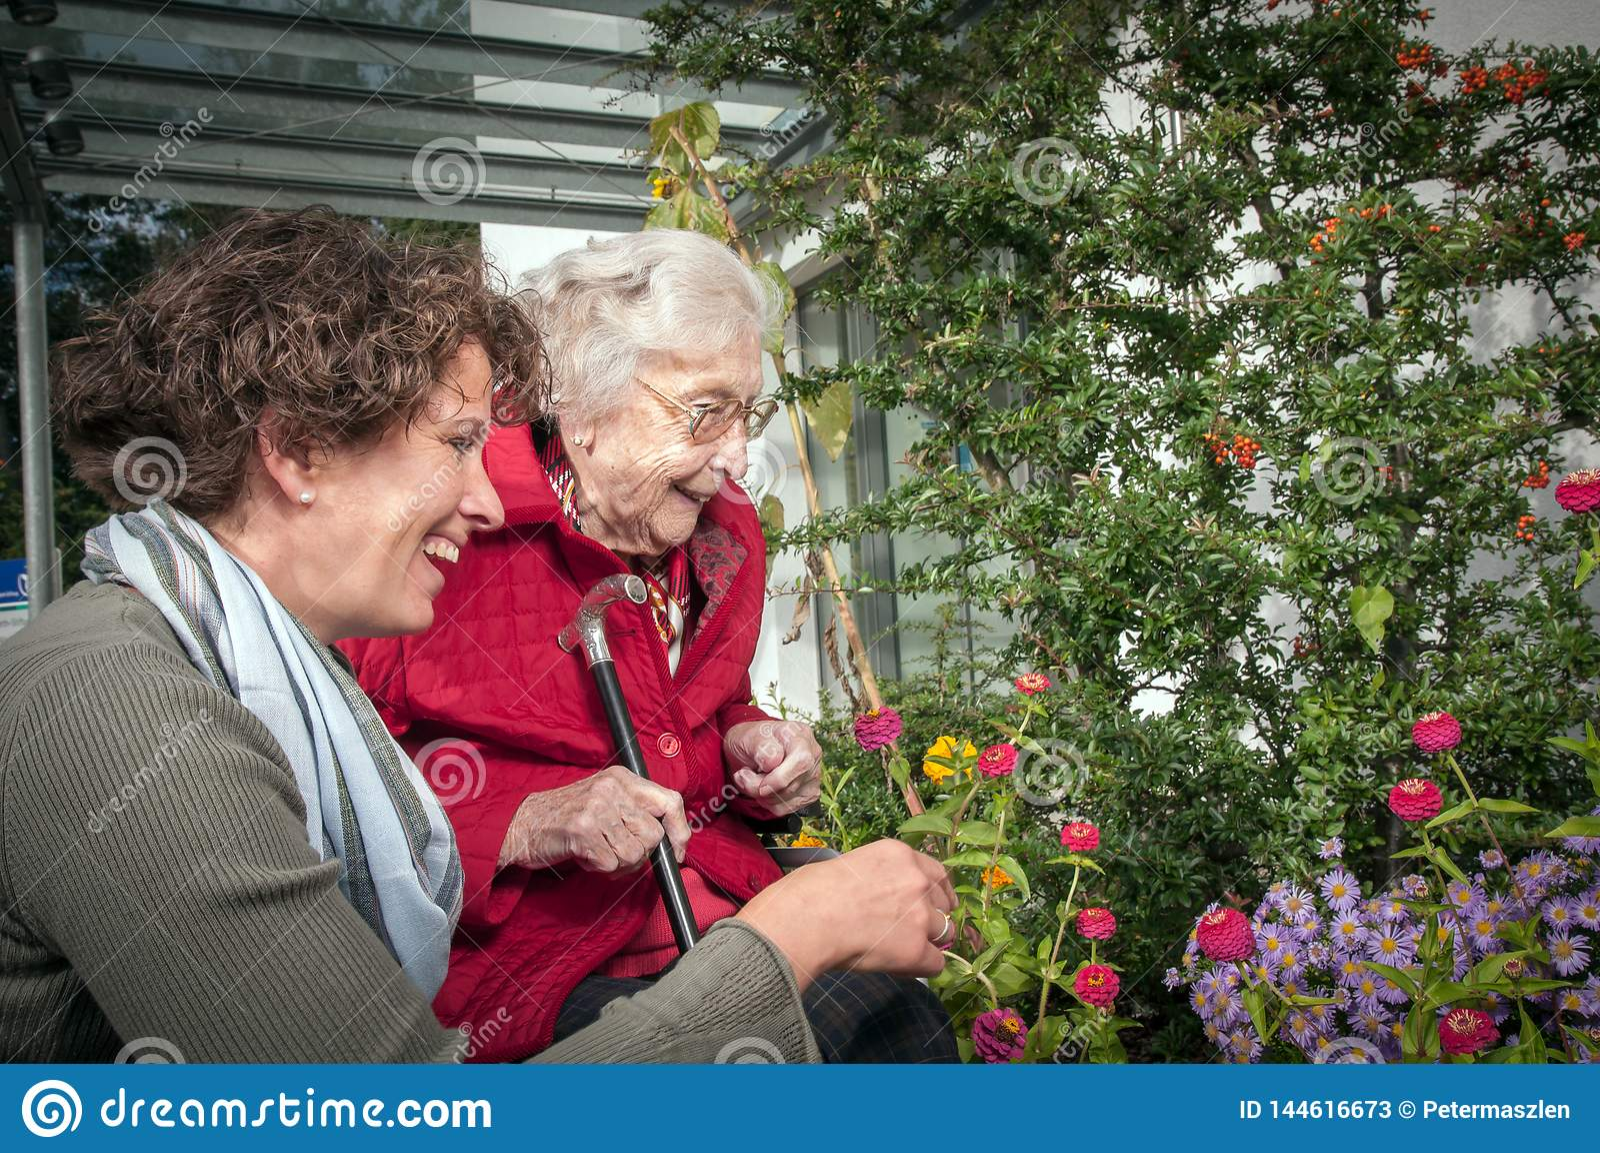 Happy senior woman and granddaughter having fun in the garden